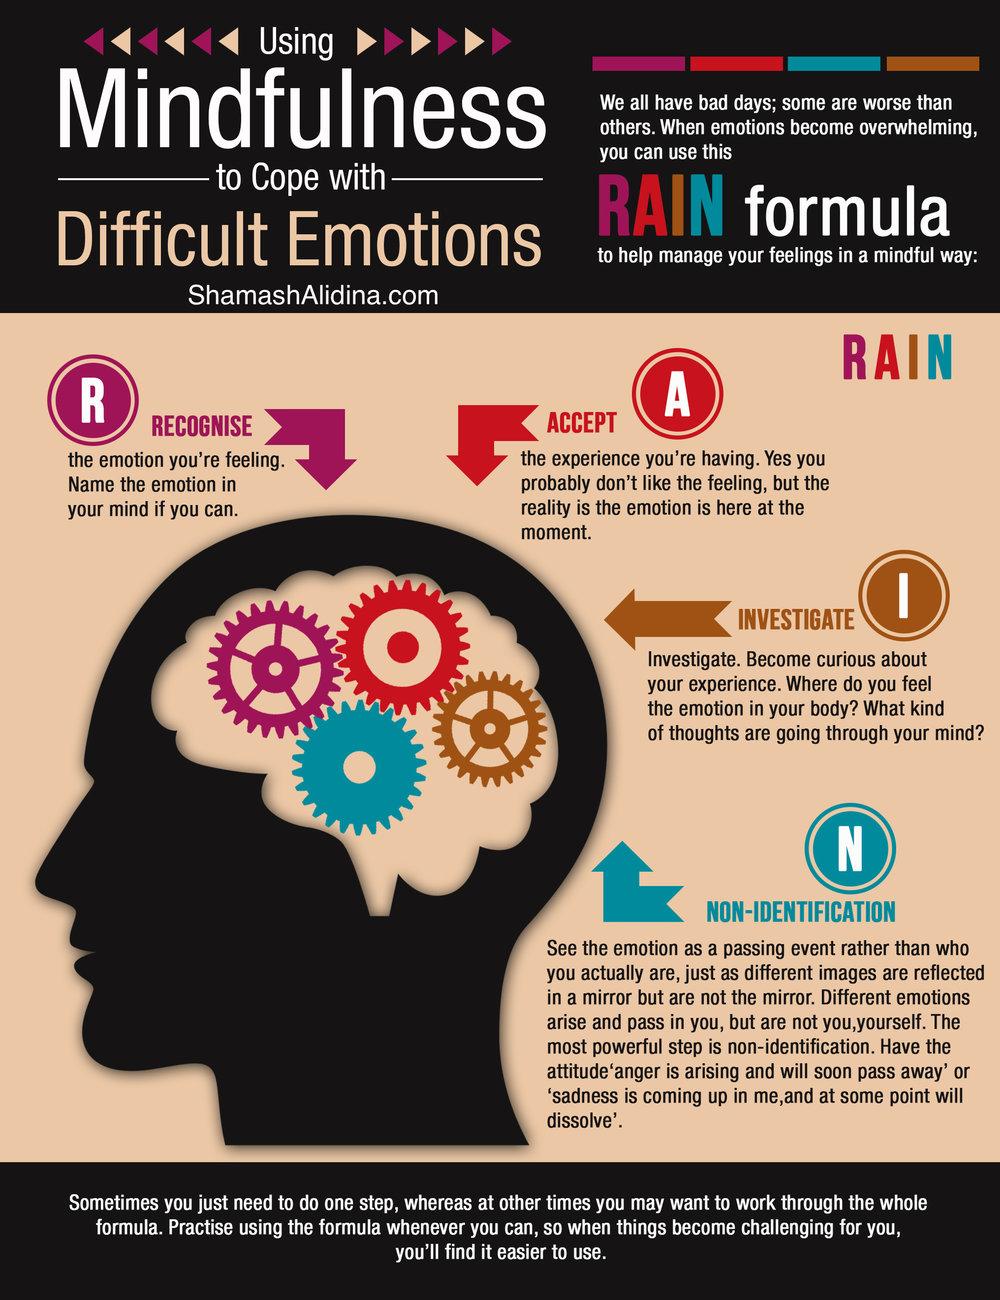 rain infographic.jpeg